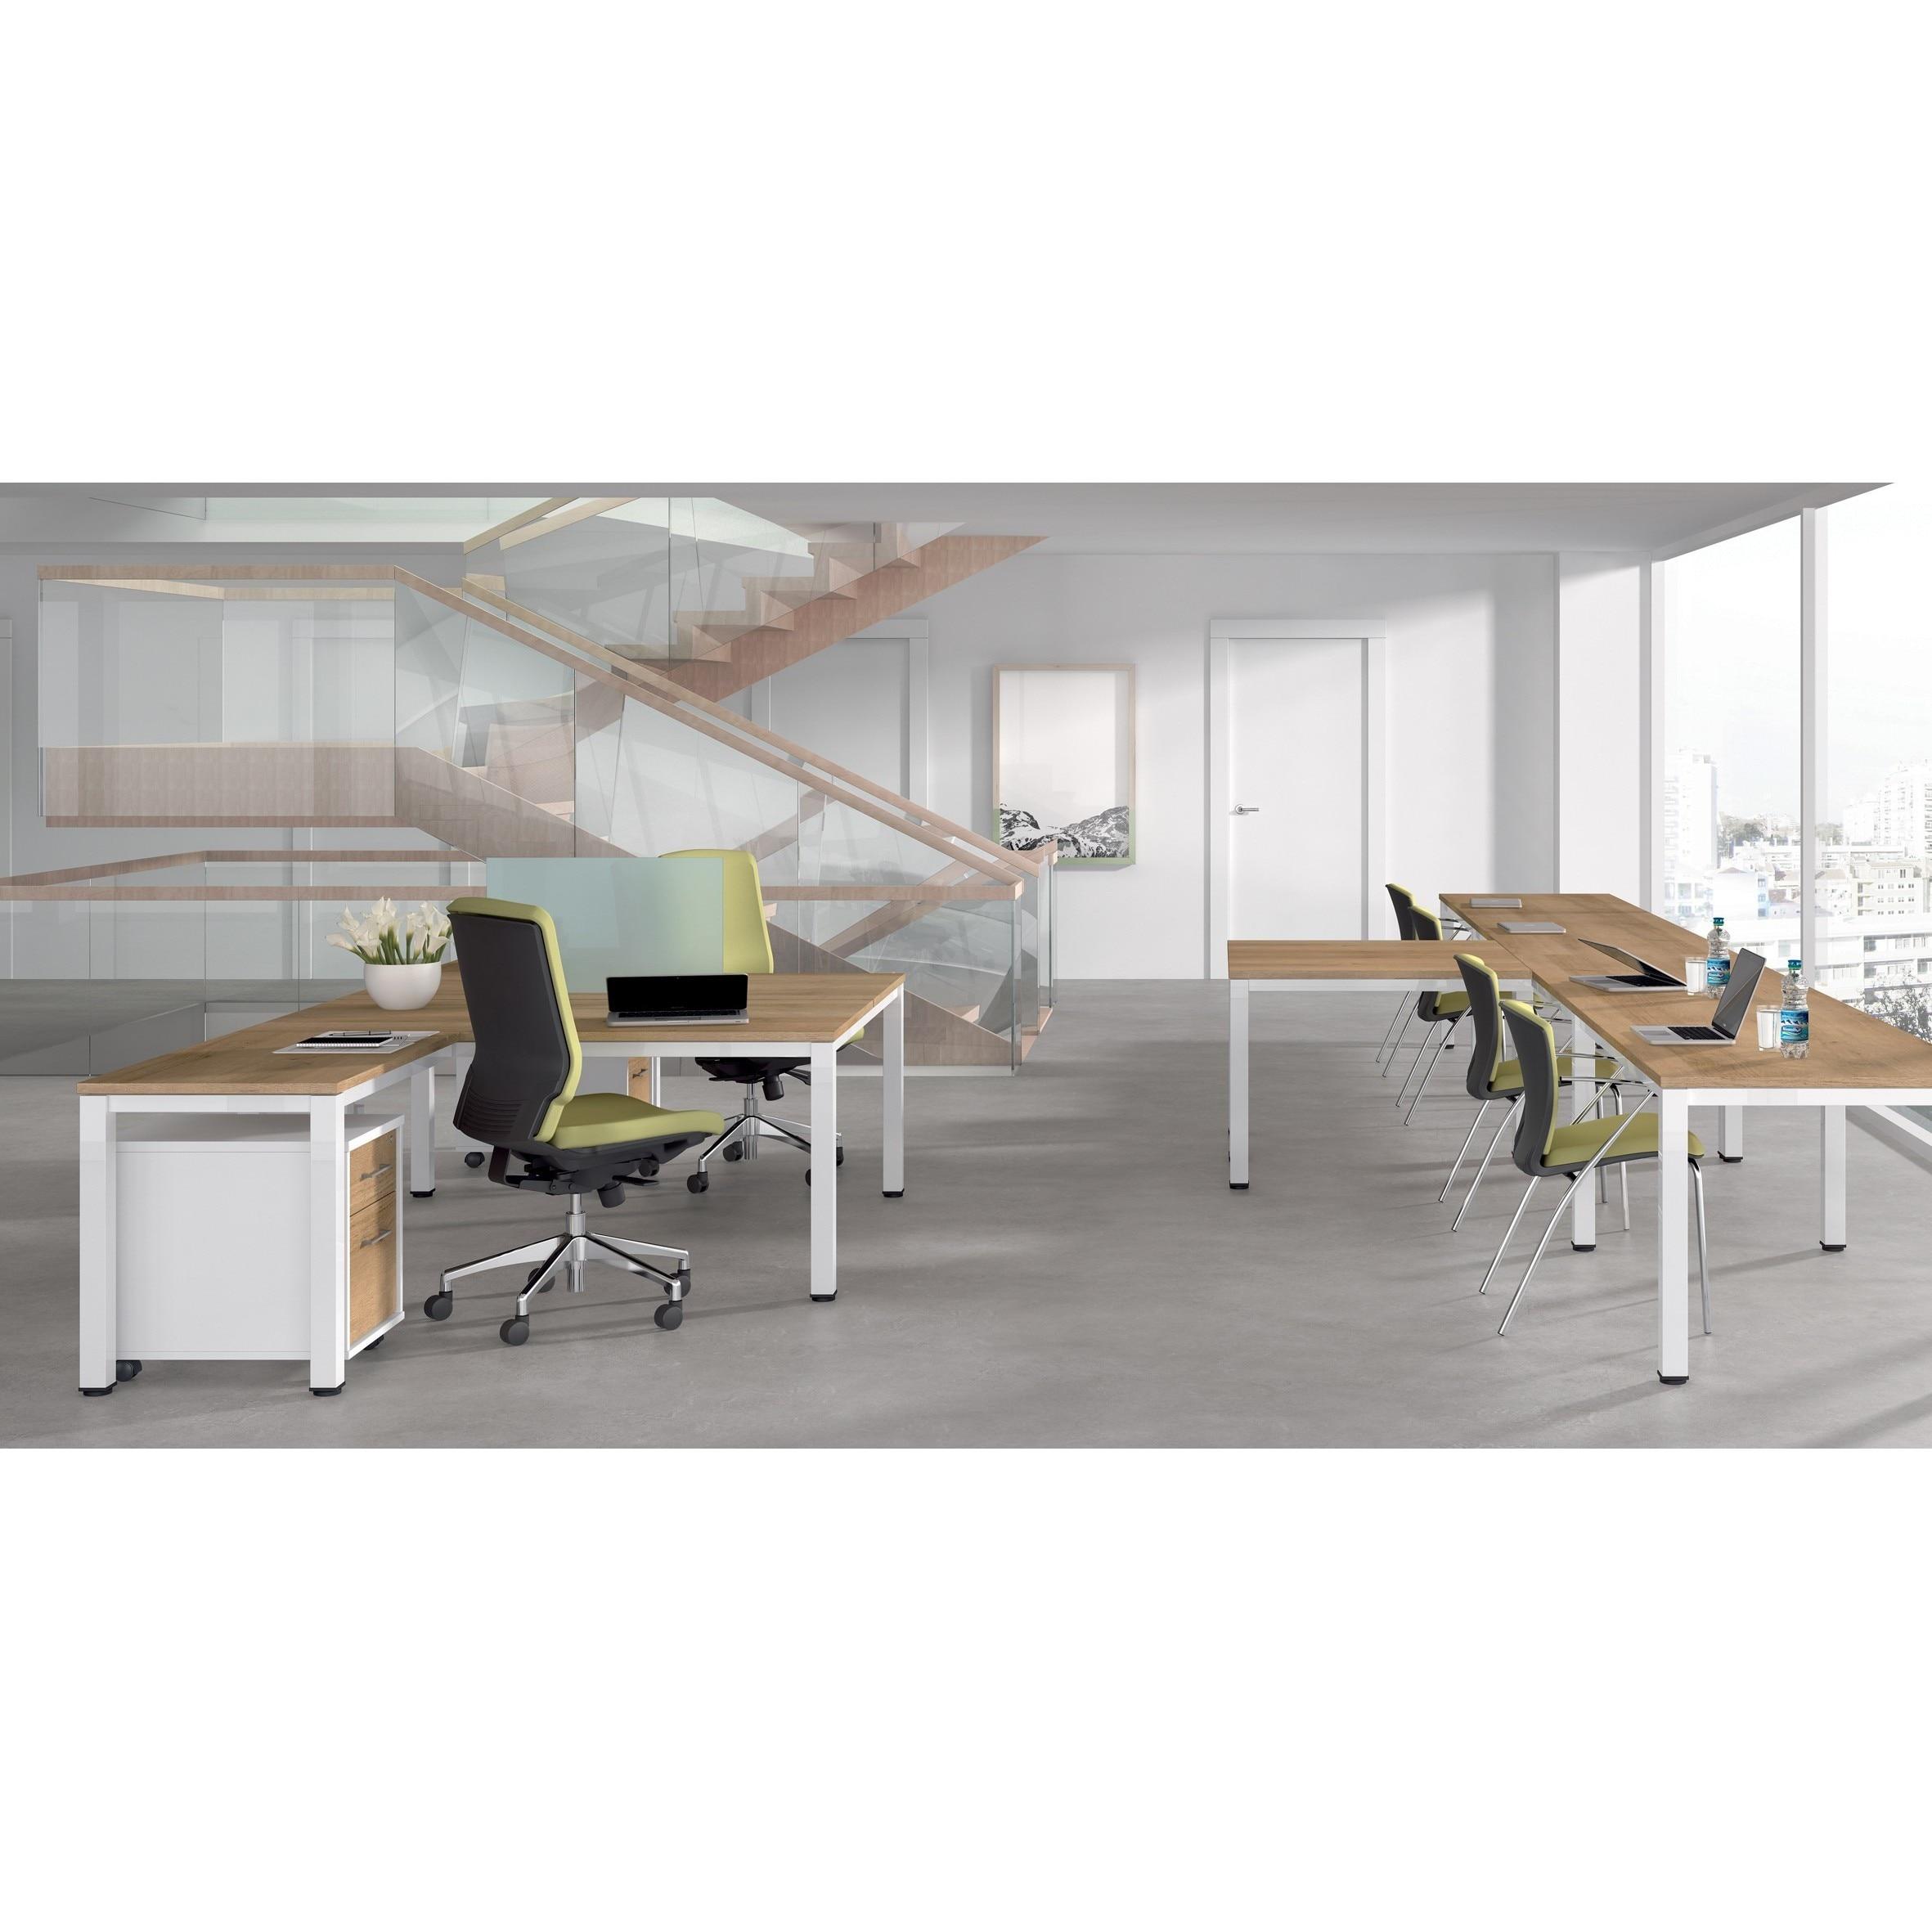 TABLE OFFICE 'S EXECUTIVE SERIES 180X80 CHROME/GREY